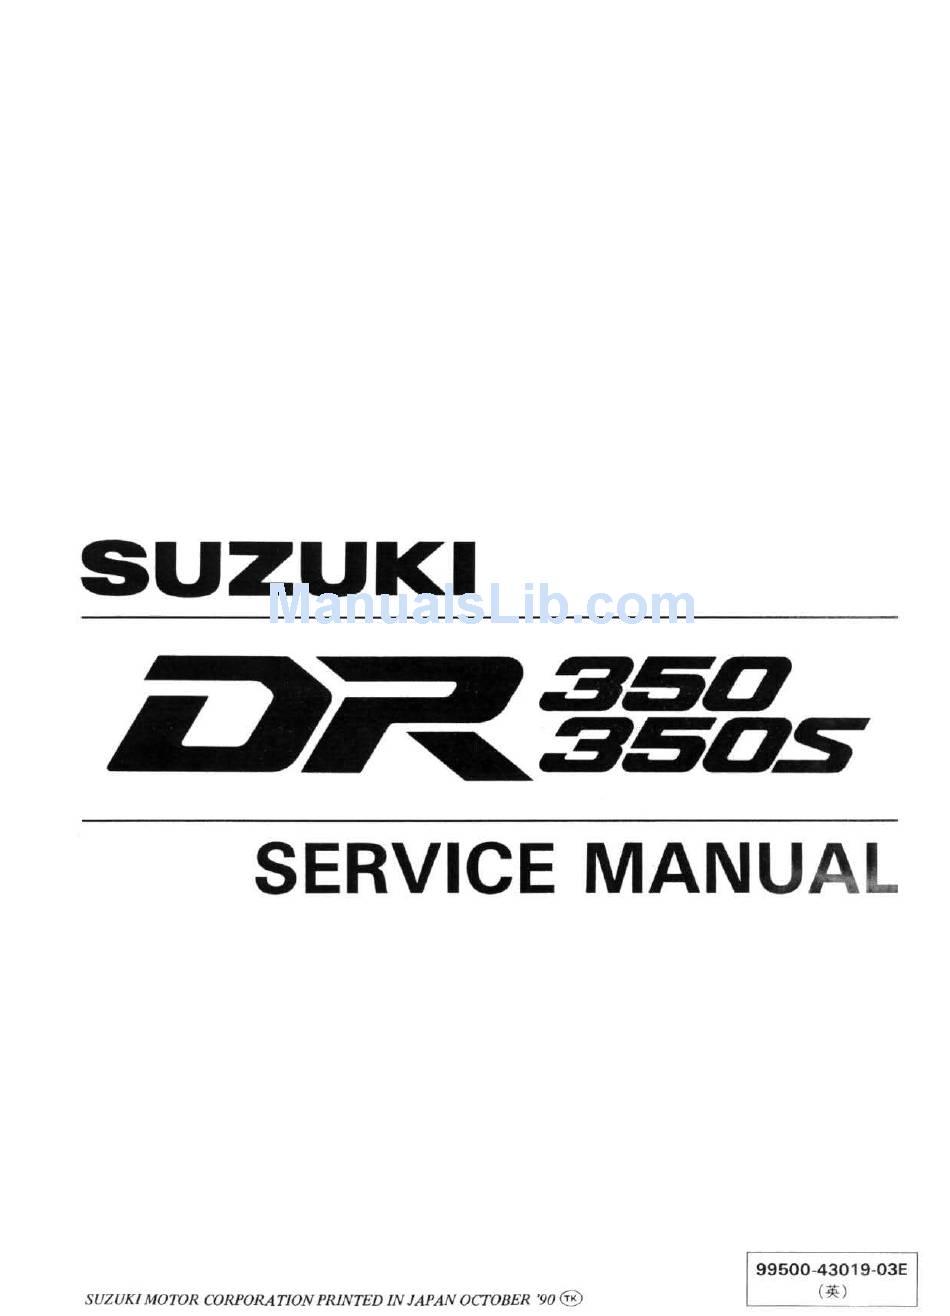 1998 Suzuki Dr350 Wiring Diagram from static-data2.manualslib.com